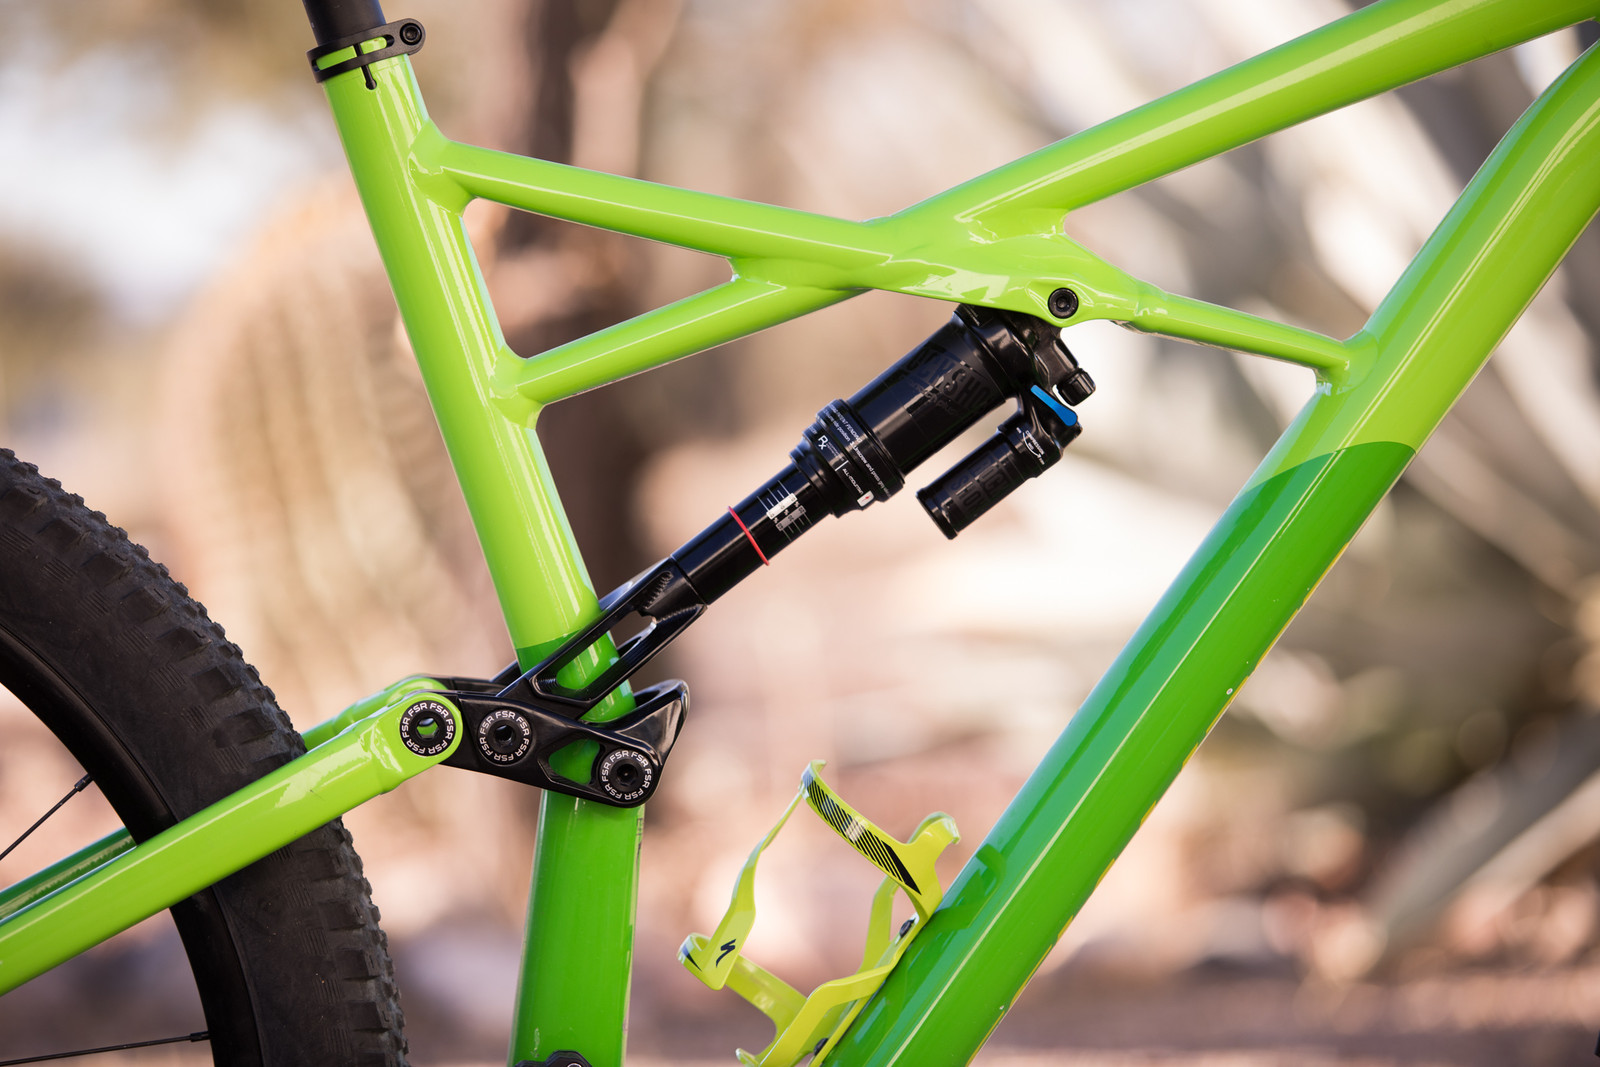 Specialized Enduro Comp 650b - 2017 Vital MTB Test Sessions - Specialized Enduro Comp 650b - 2017 Vital MTB Test Sessions - Mountain Biking Pictures - Vital MTB